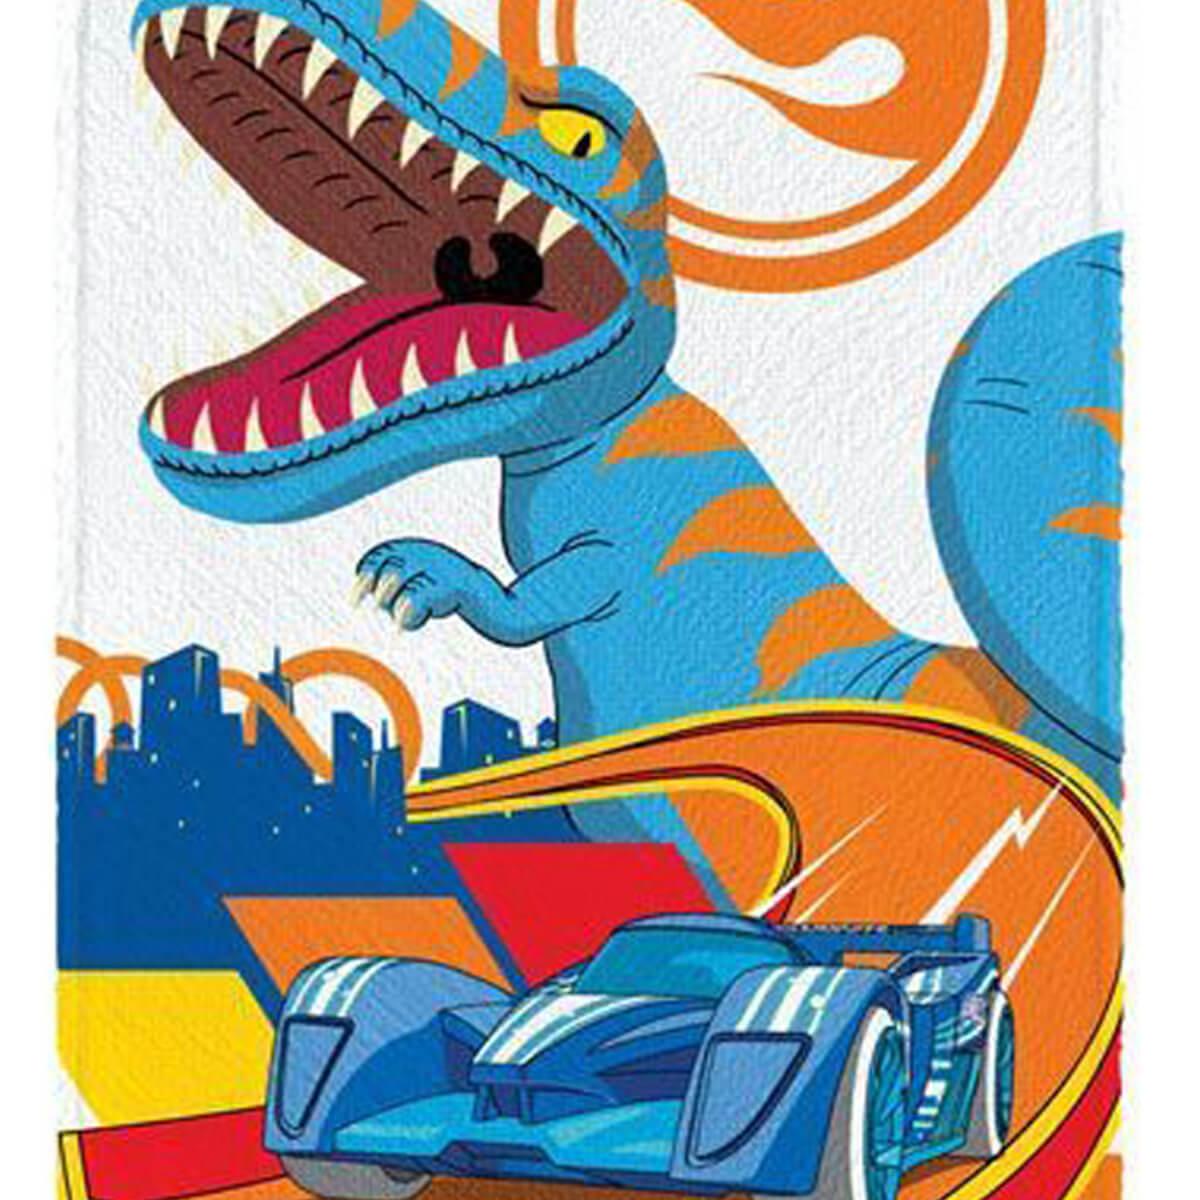 Toalha de Banho Infantil Felpuda Hot Wheels T-Rex Fury